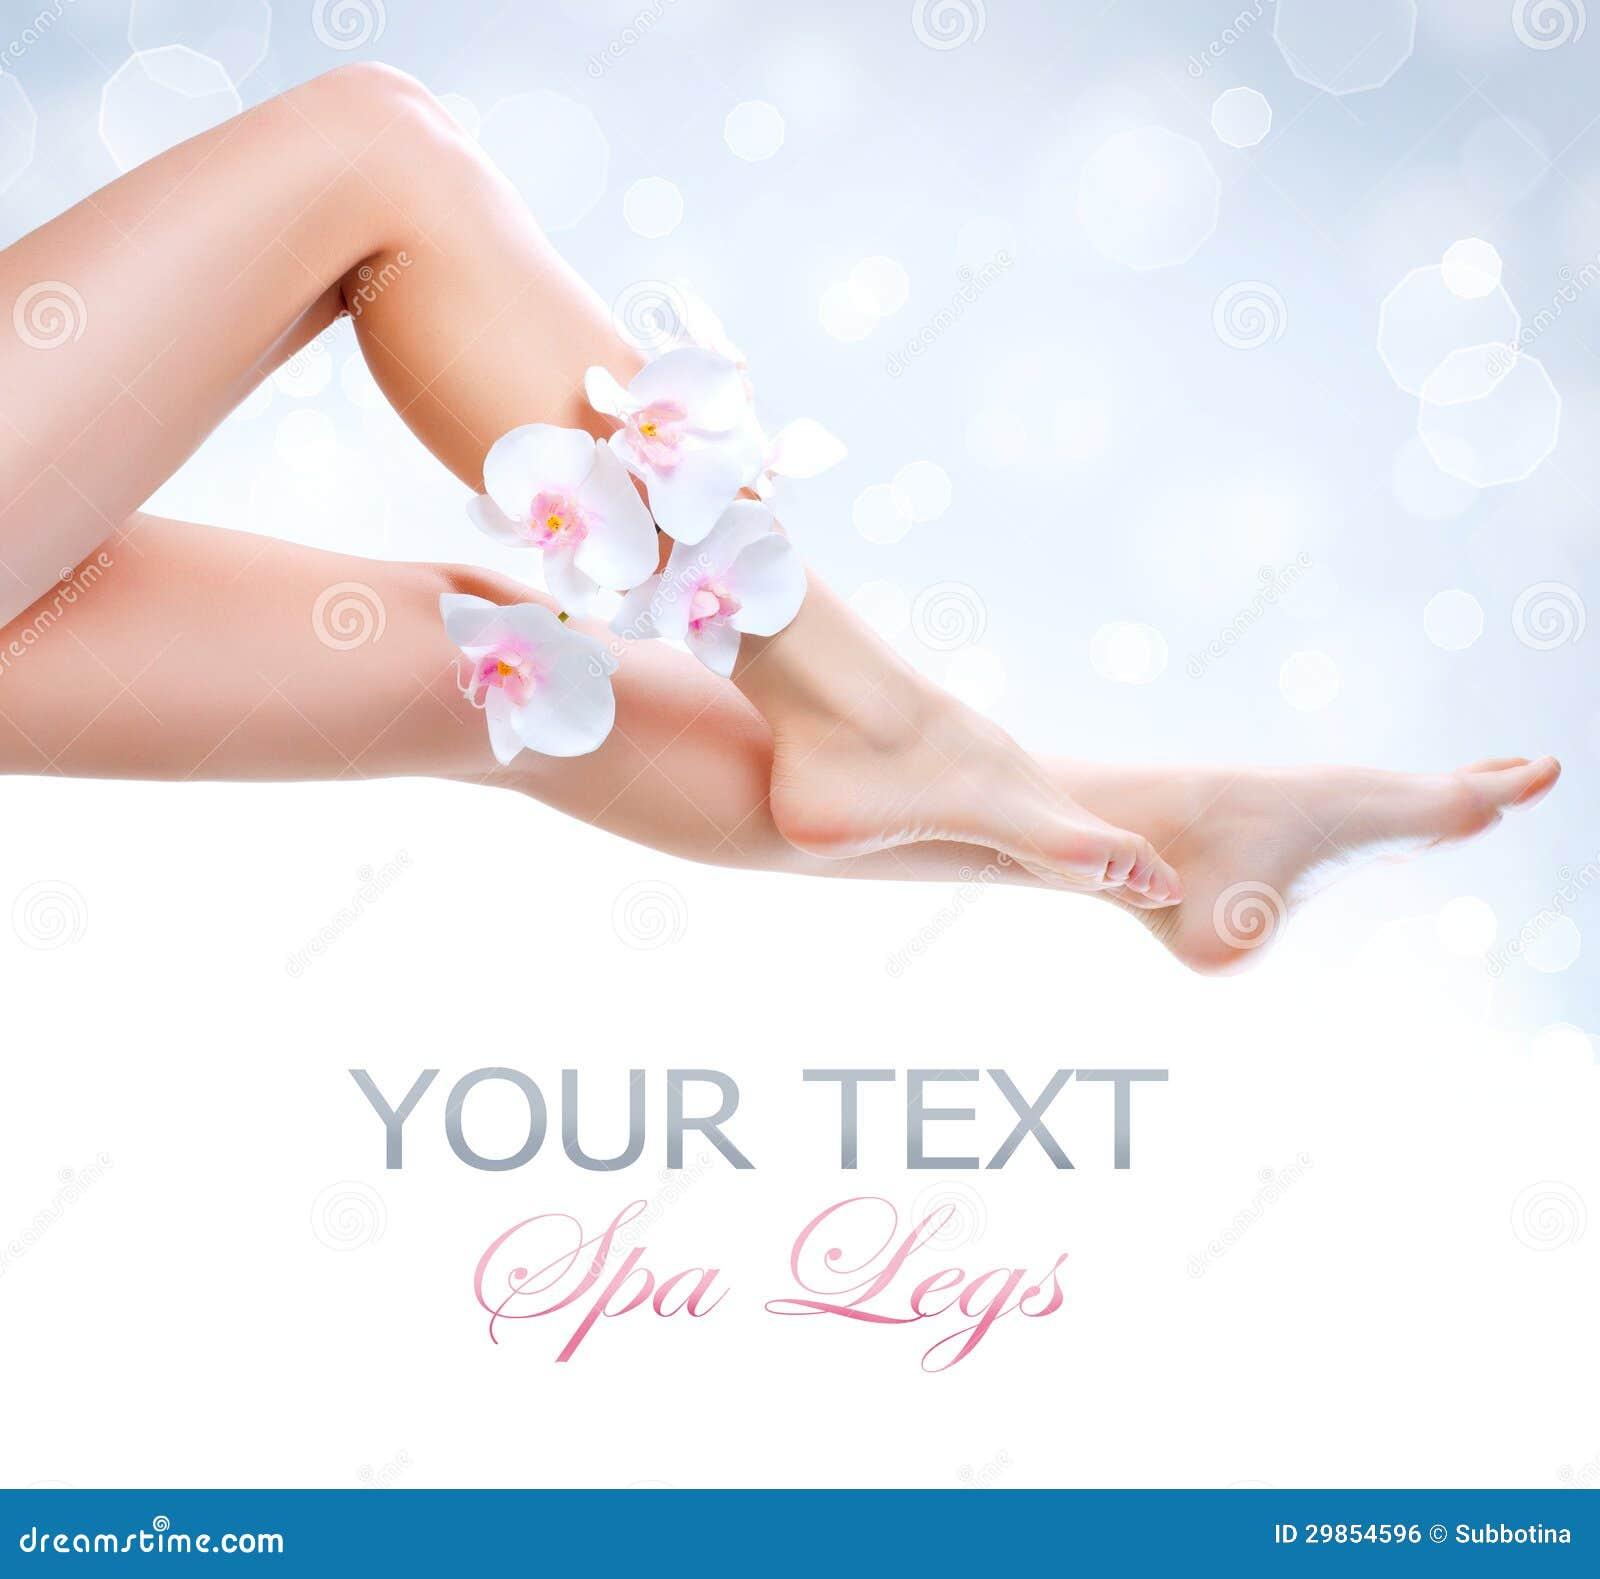 Healthy Legs. Spa